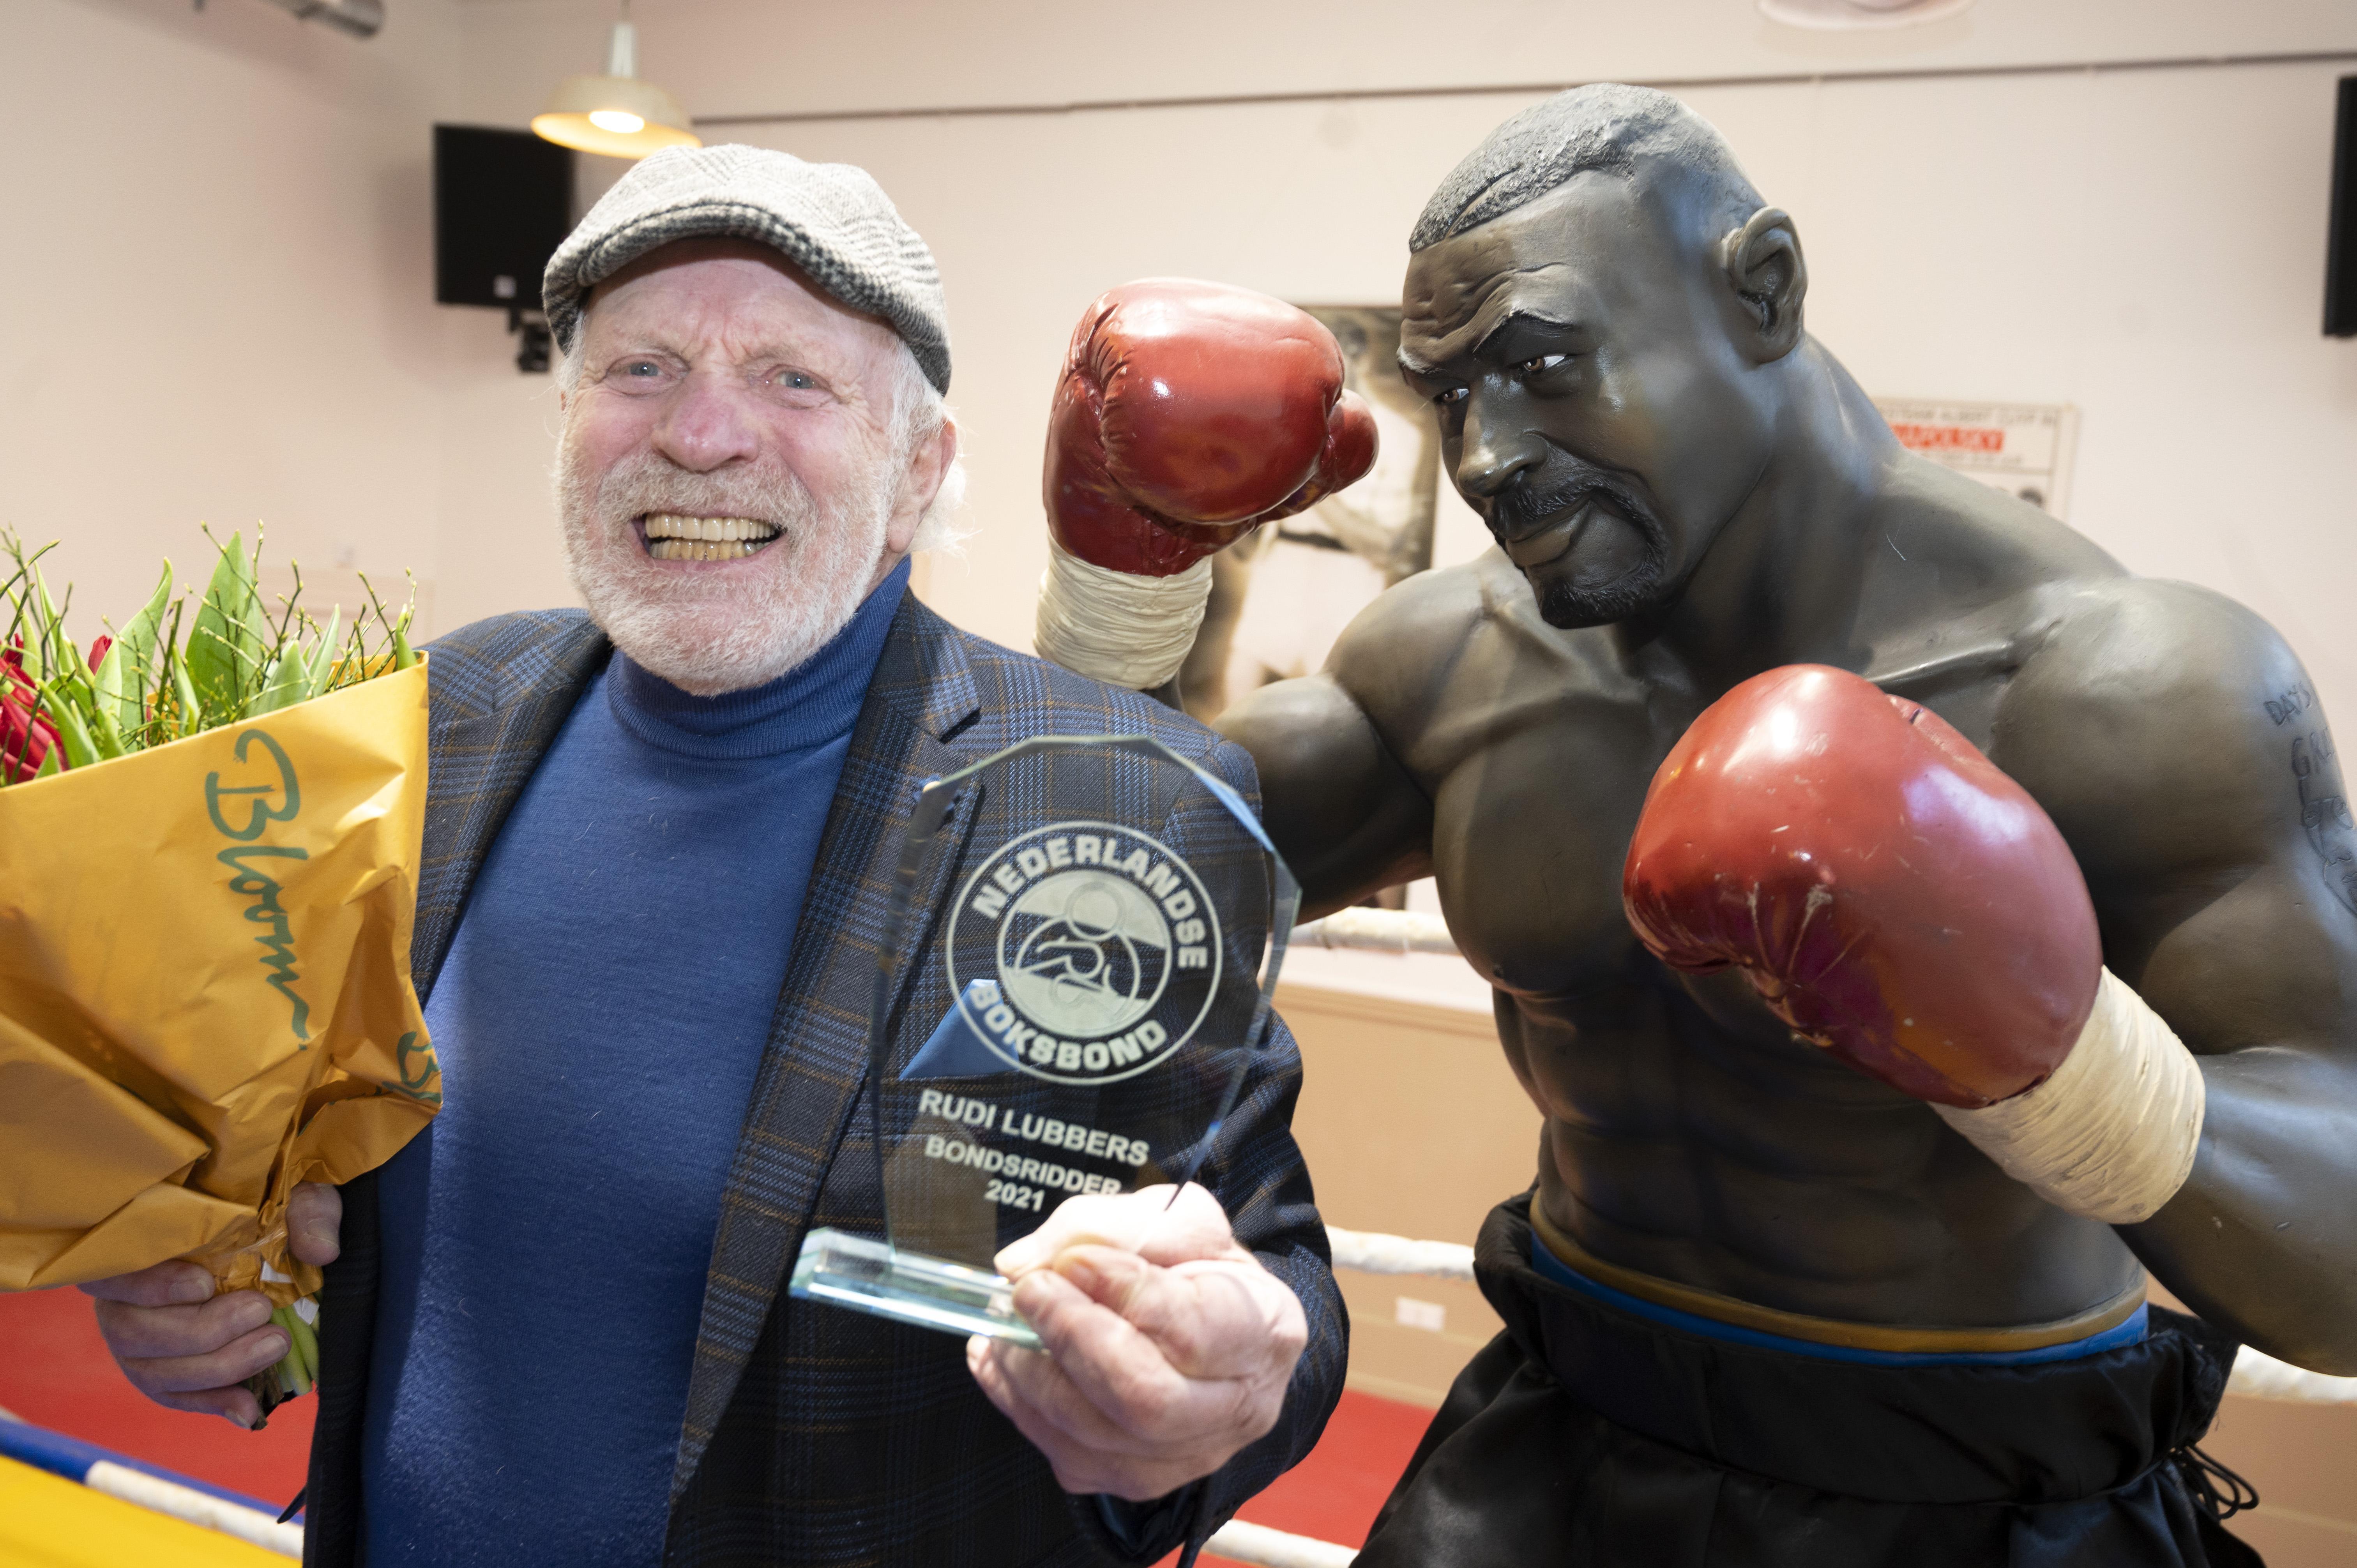 Eerbetoon boksbond aan Rudi Lubbers (75). Oud-bokser uit Heerhugowaard benoemd tot bondsridder